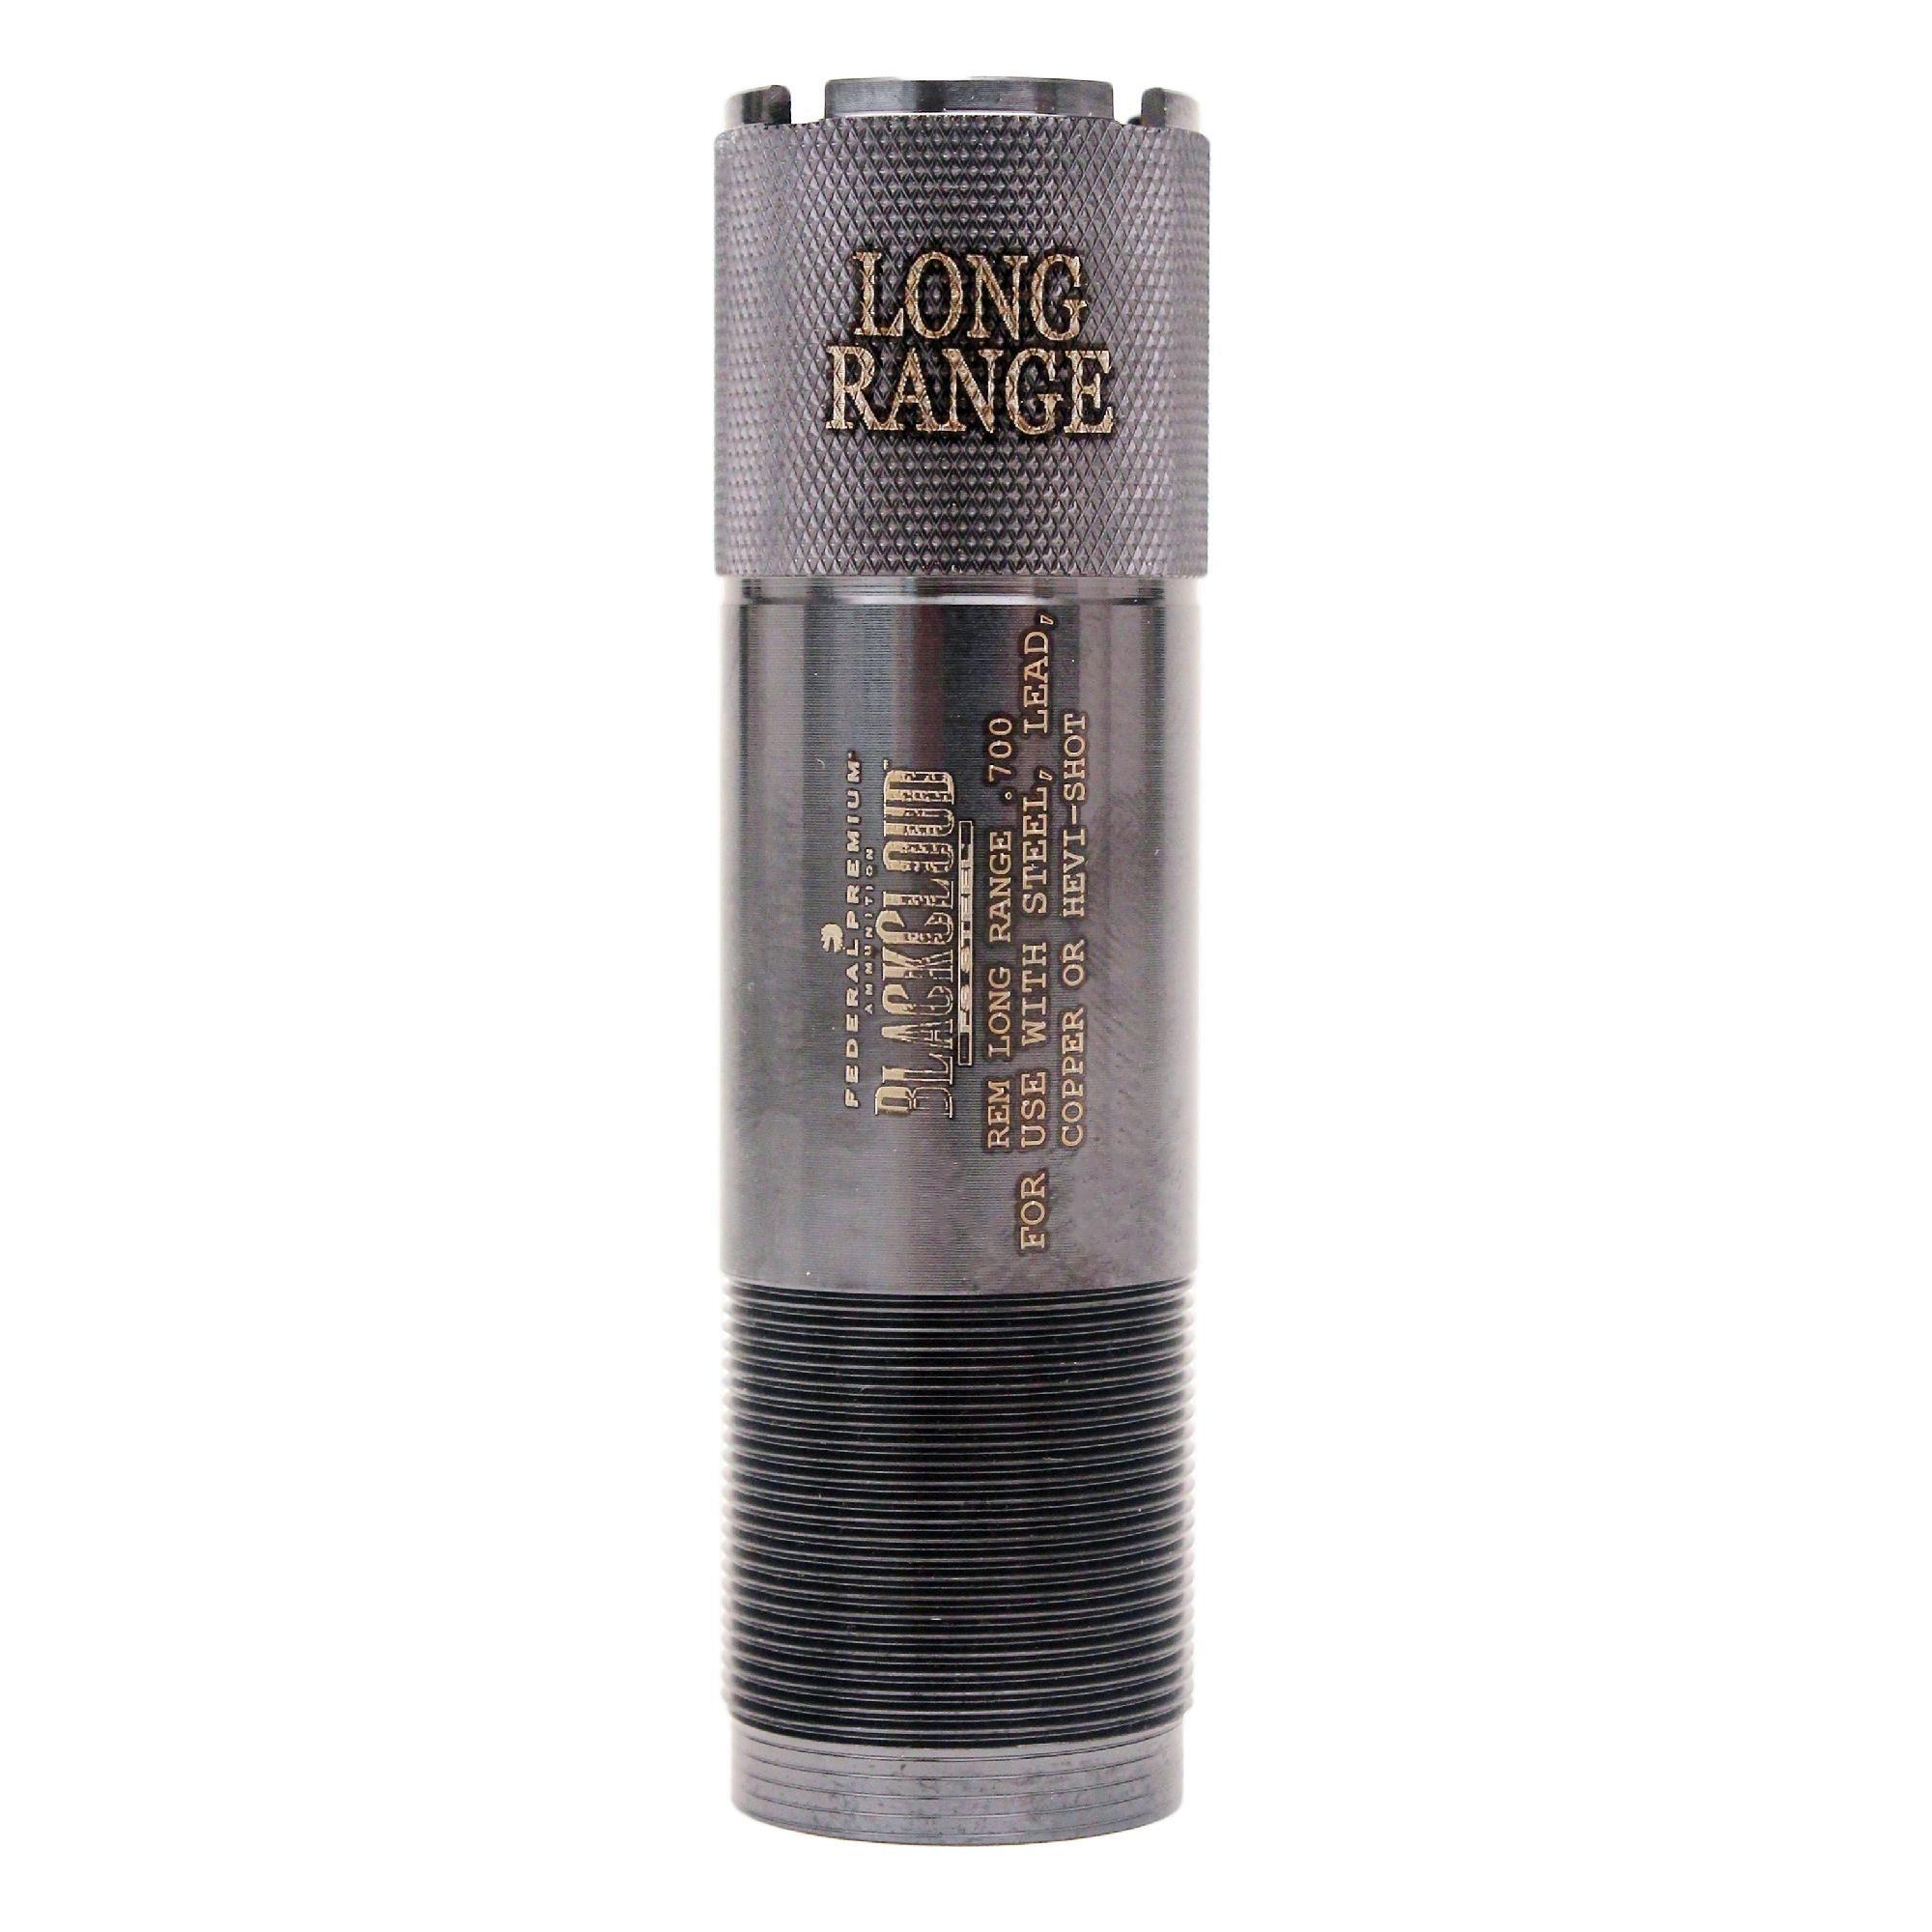 Black Cloud Choke Tube - 12 Gauge, Remington, Long Range